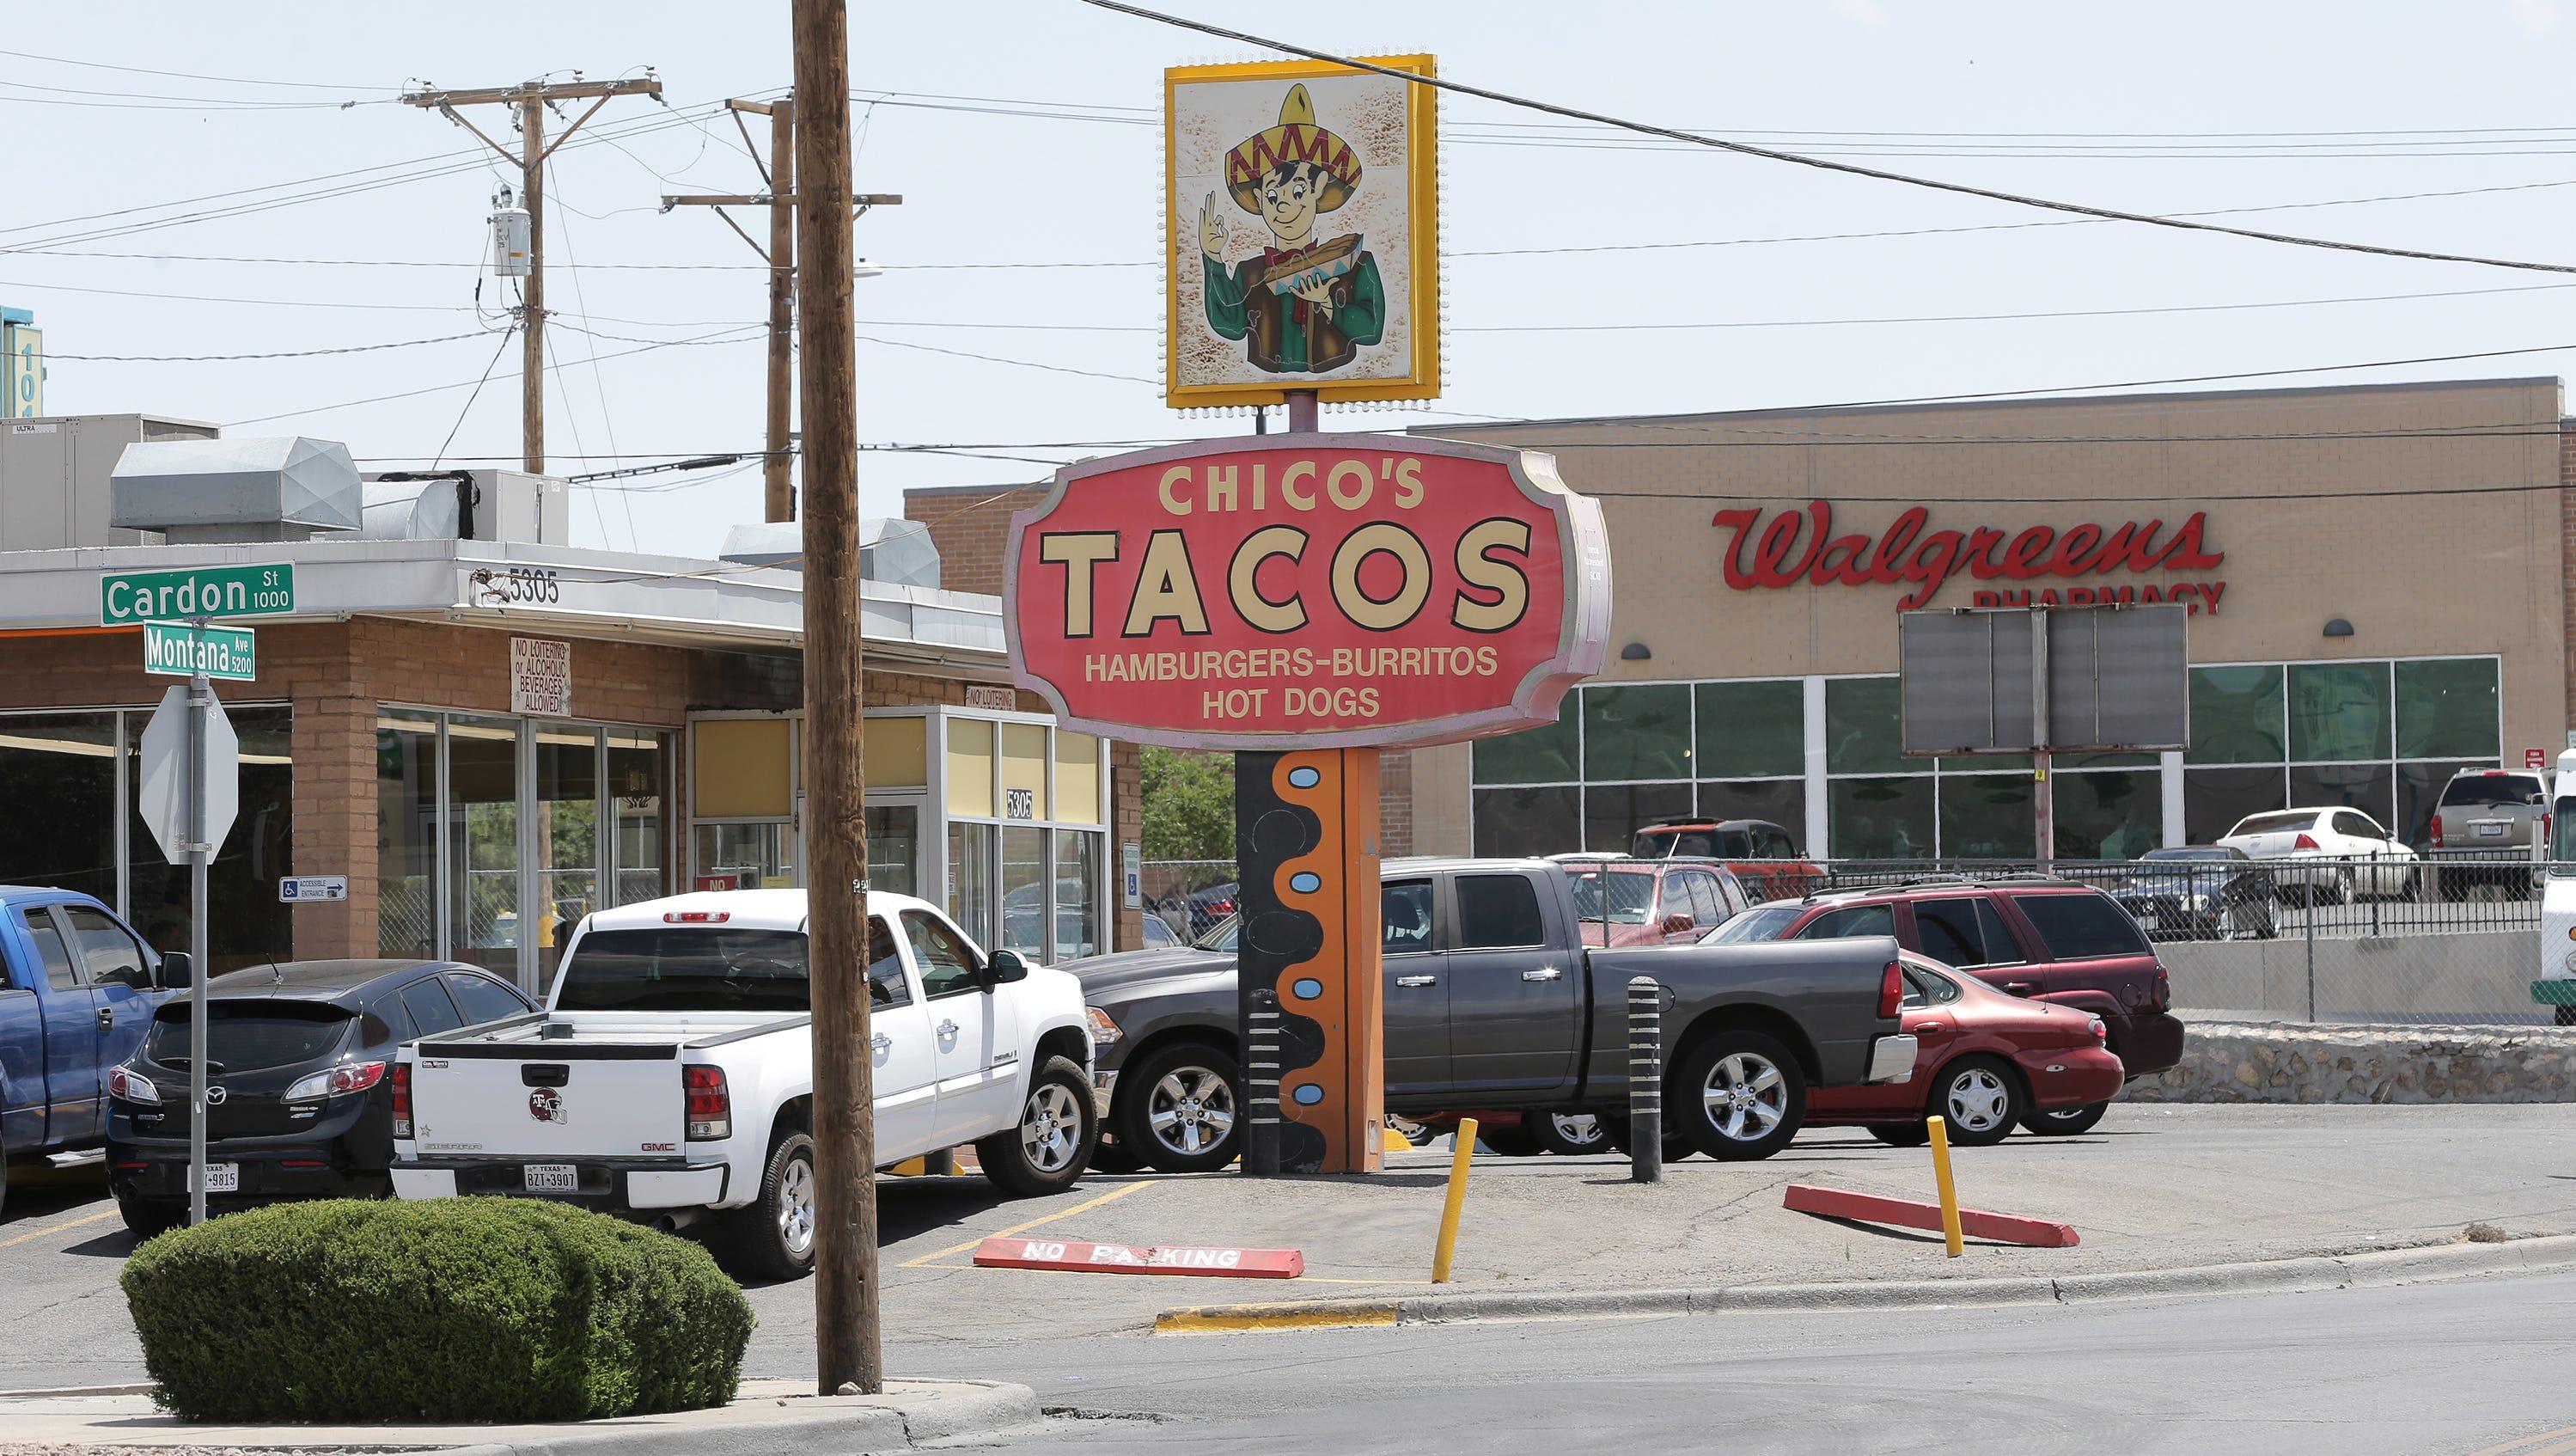 cvs plans store at chico u0026 39 s tacos site